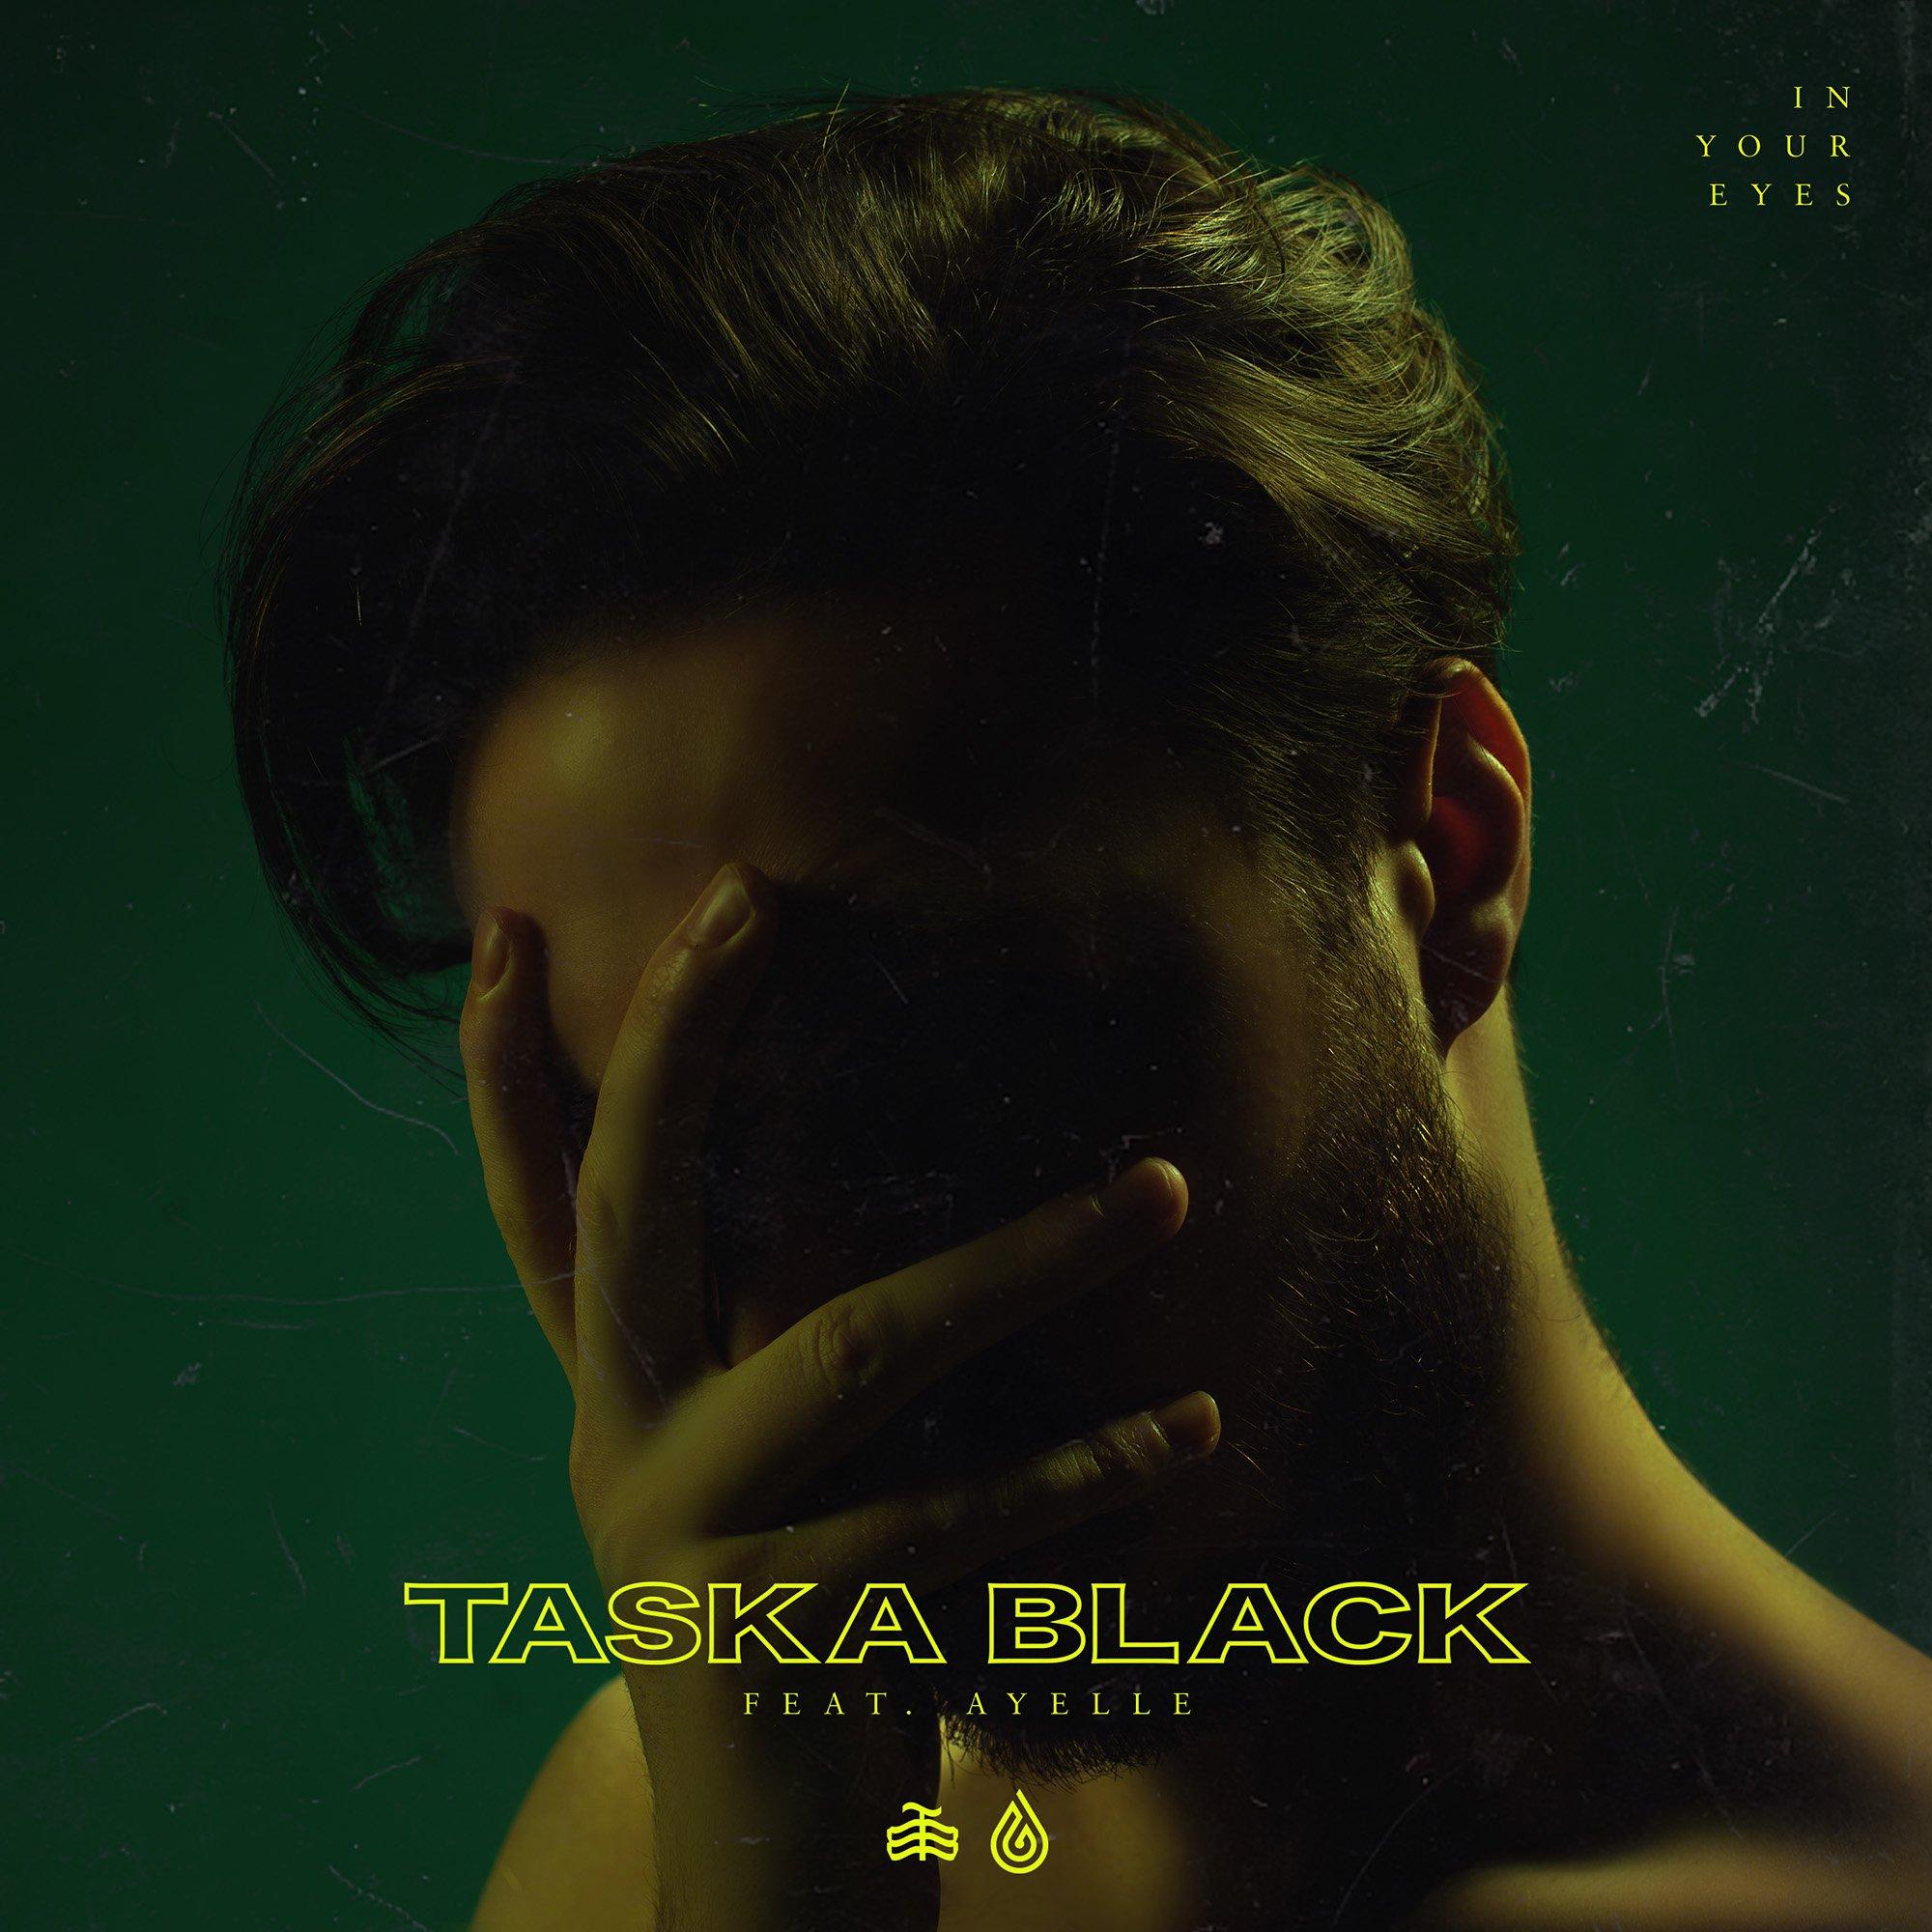 Taska Black - In Your Eyes | Your EDM